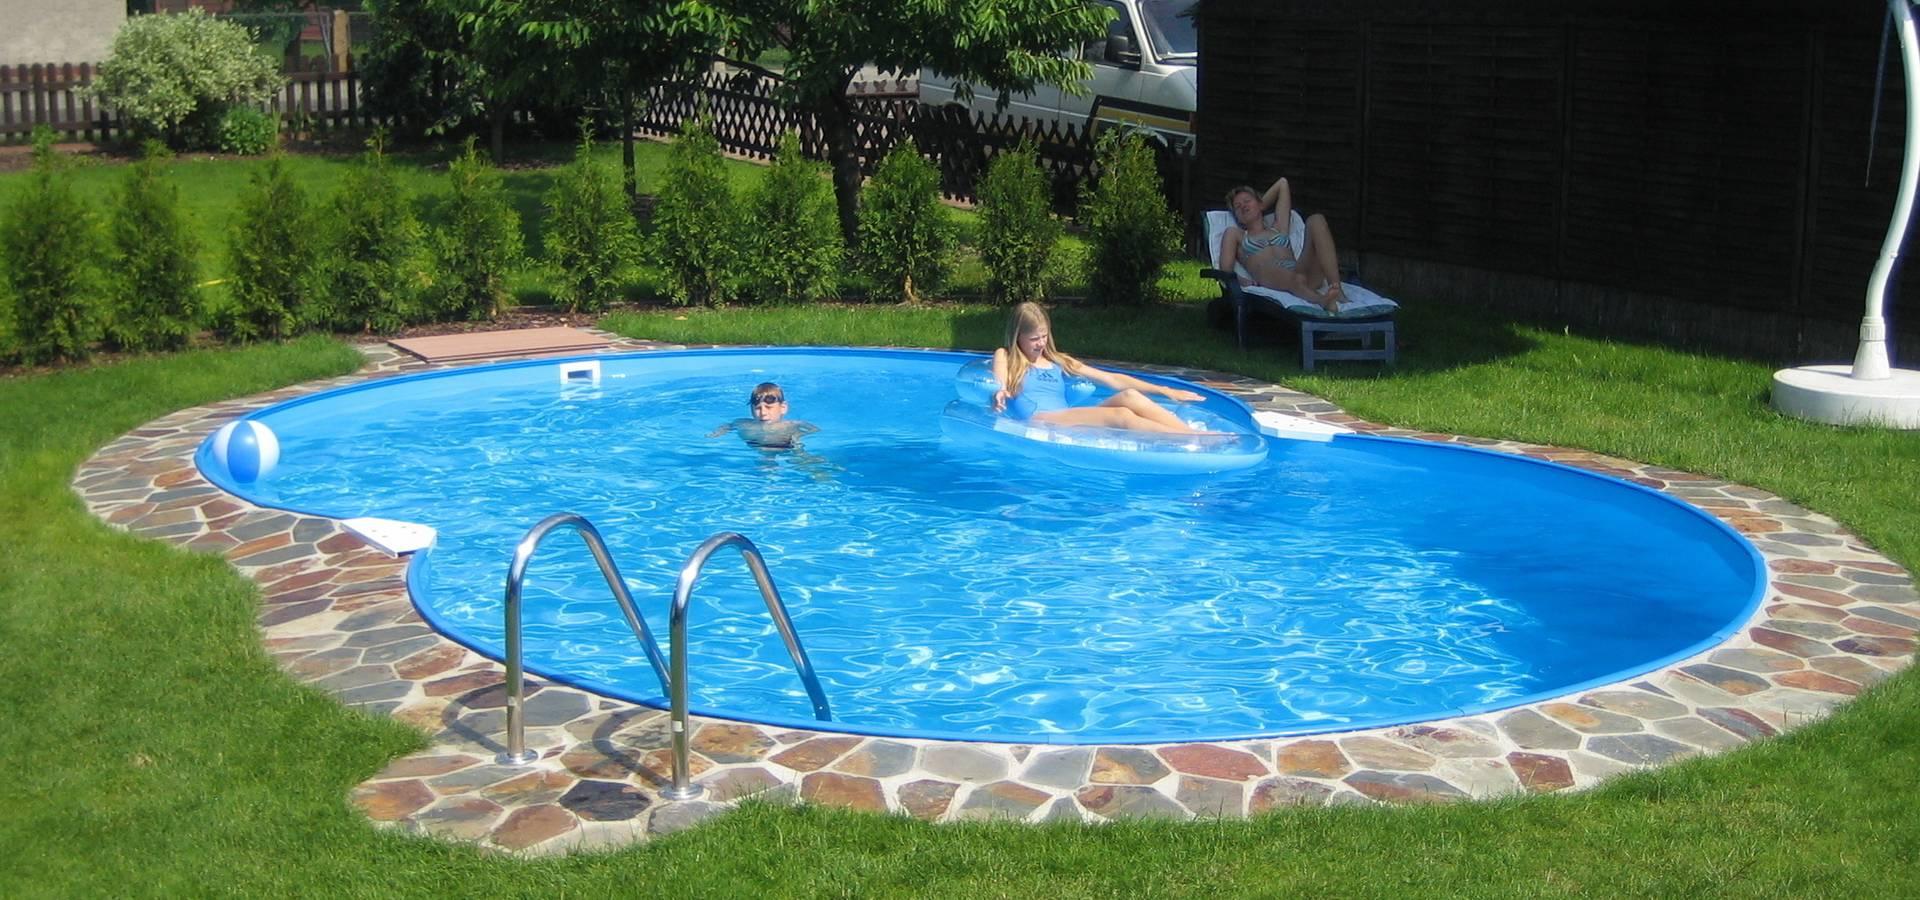 Future Pool GmbH